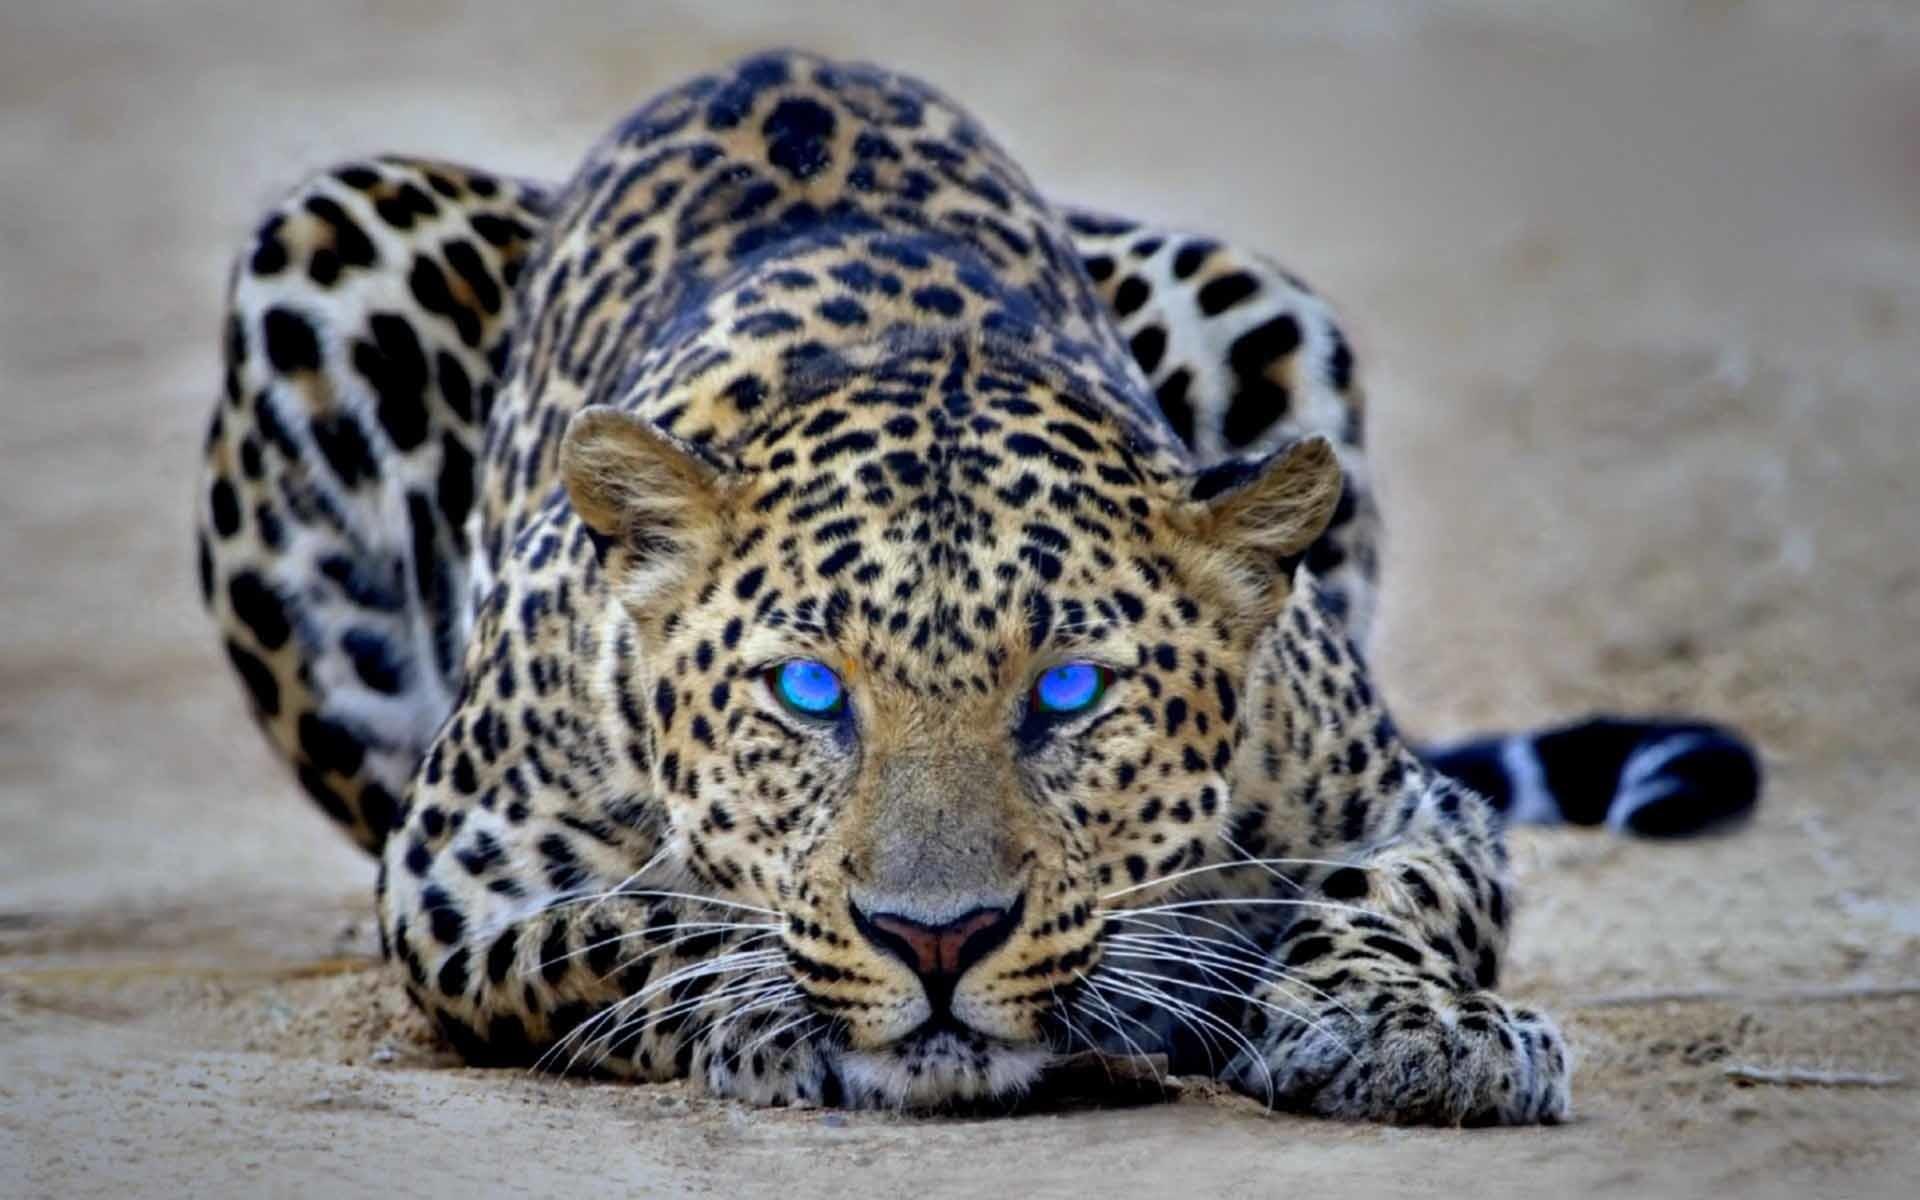 Res: 1920x1200, Cheetah HD wallpaper for download